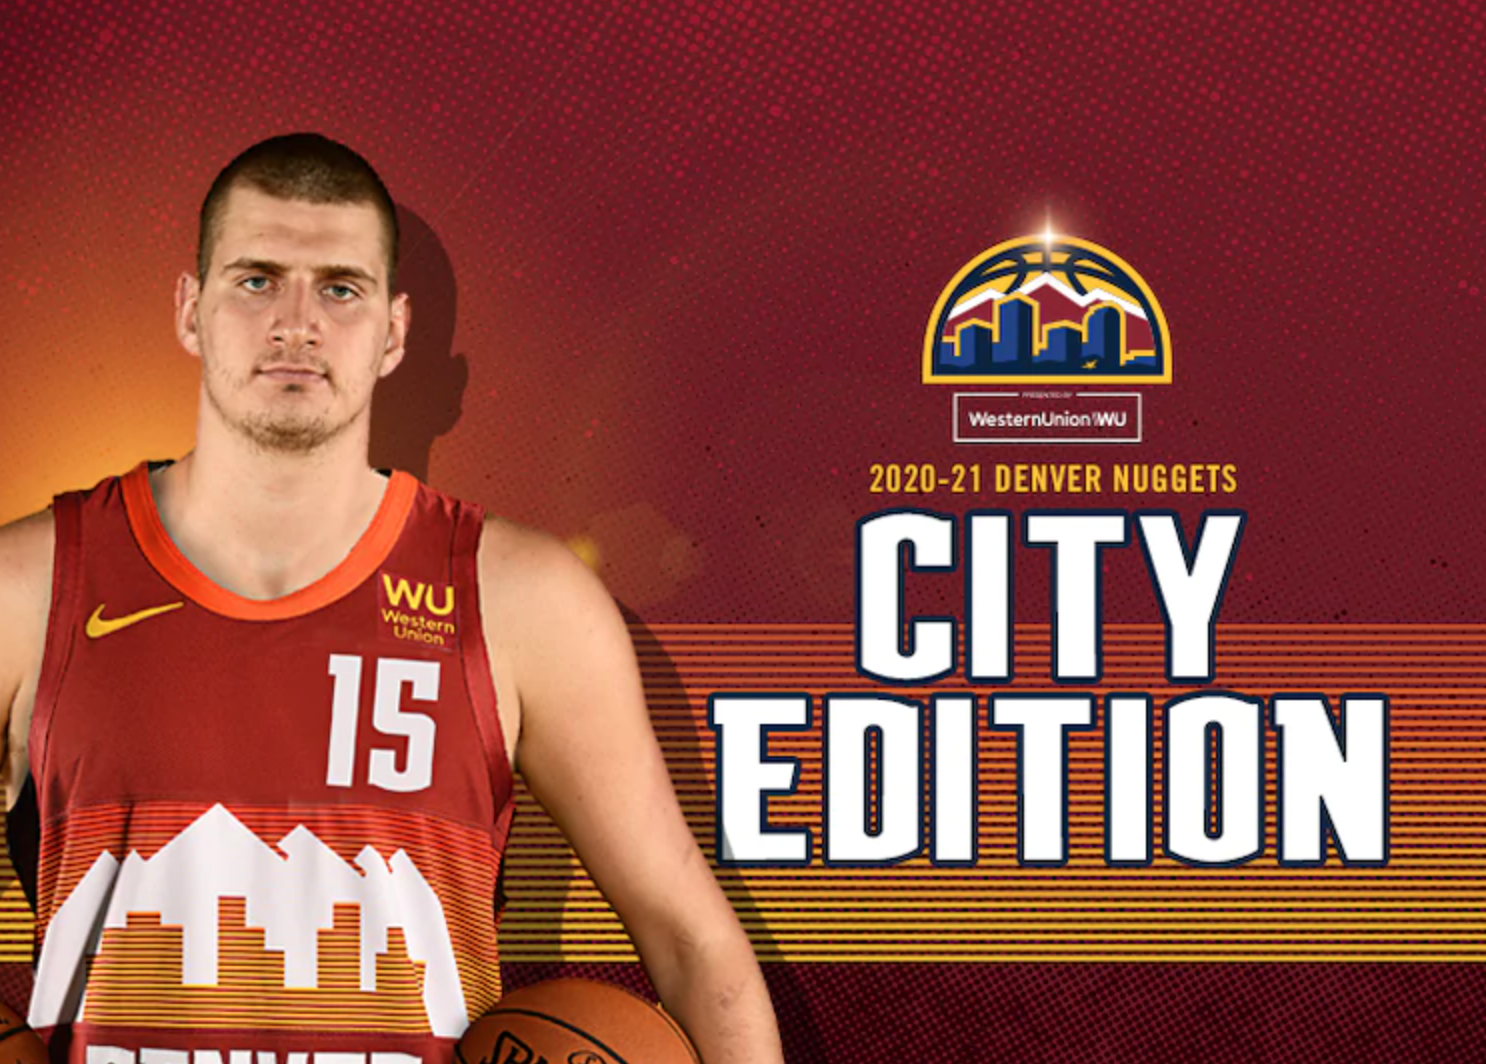 Divisa Denver Nuggets- City edition 2021